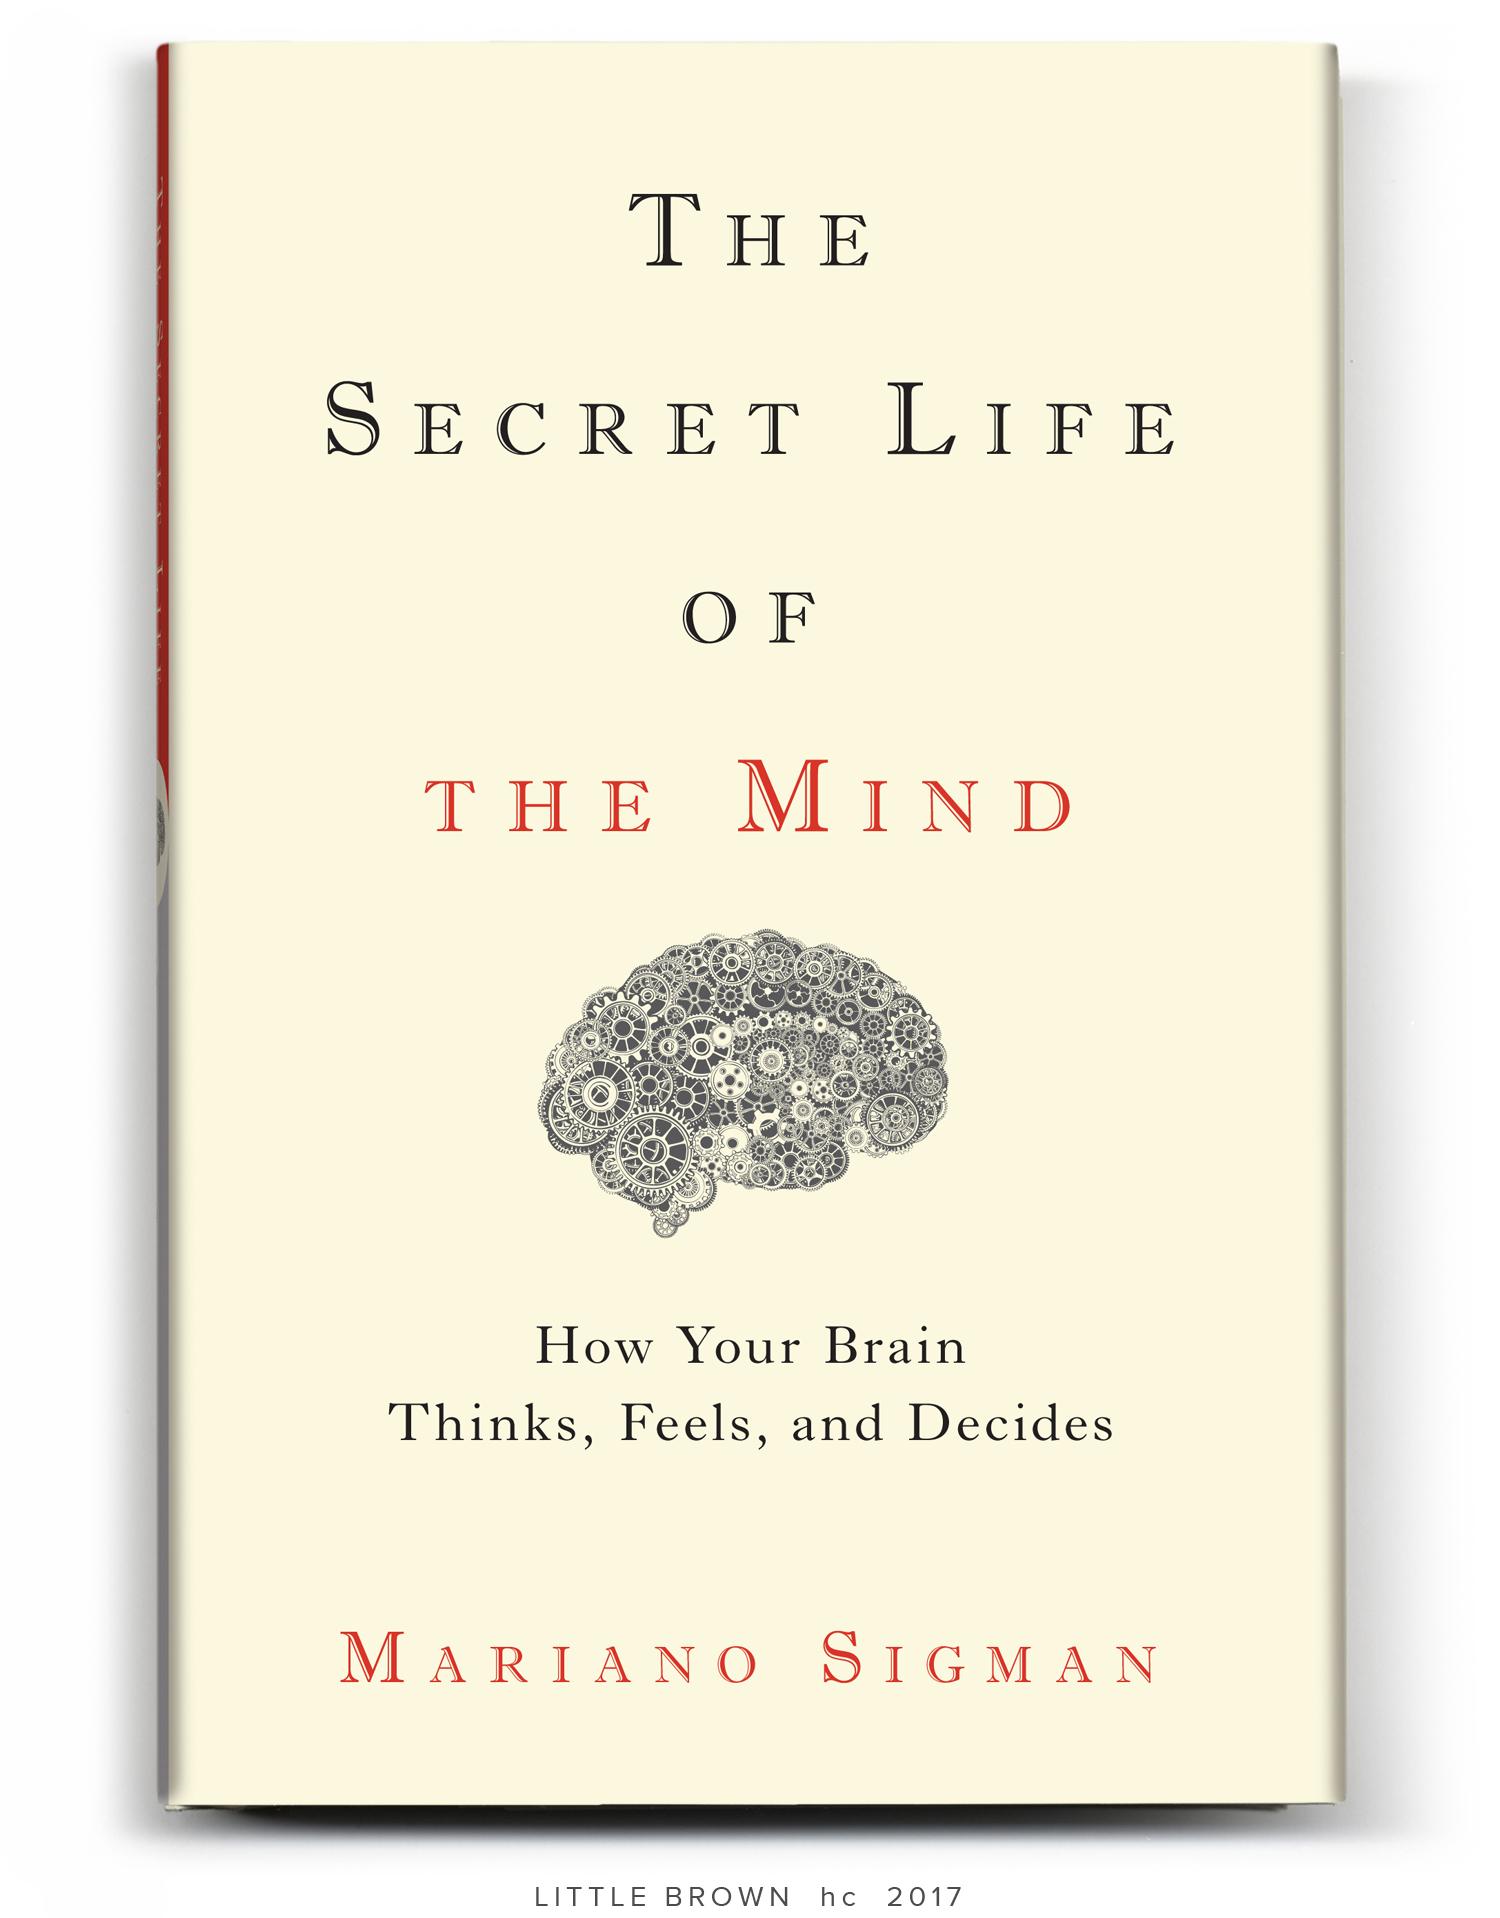 THE-SECRET-LIFE-OF-MIND-hc-ss6v2.jpg